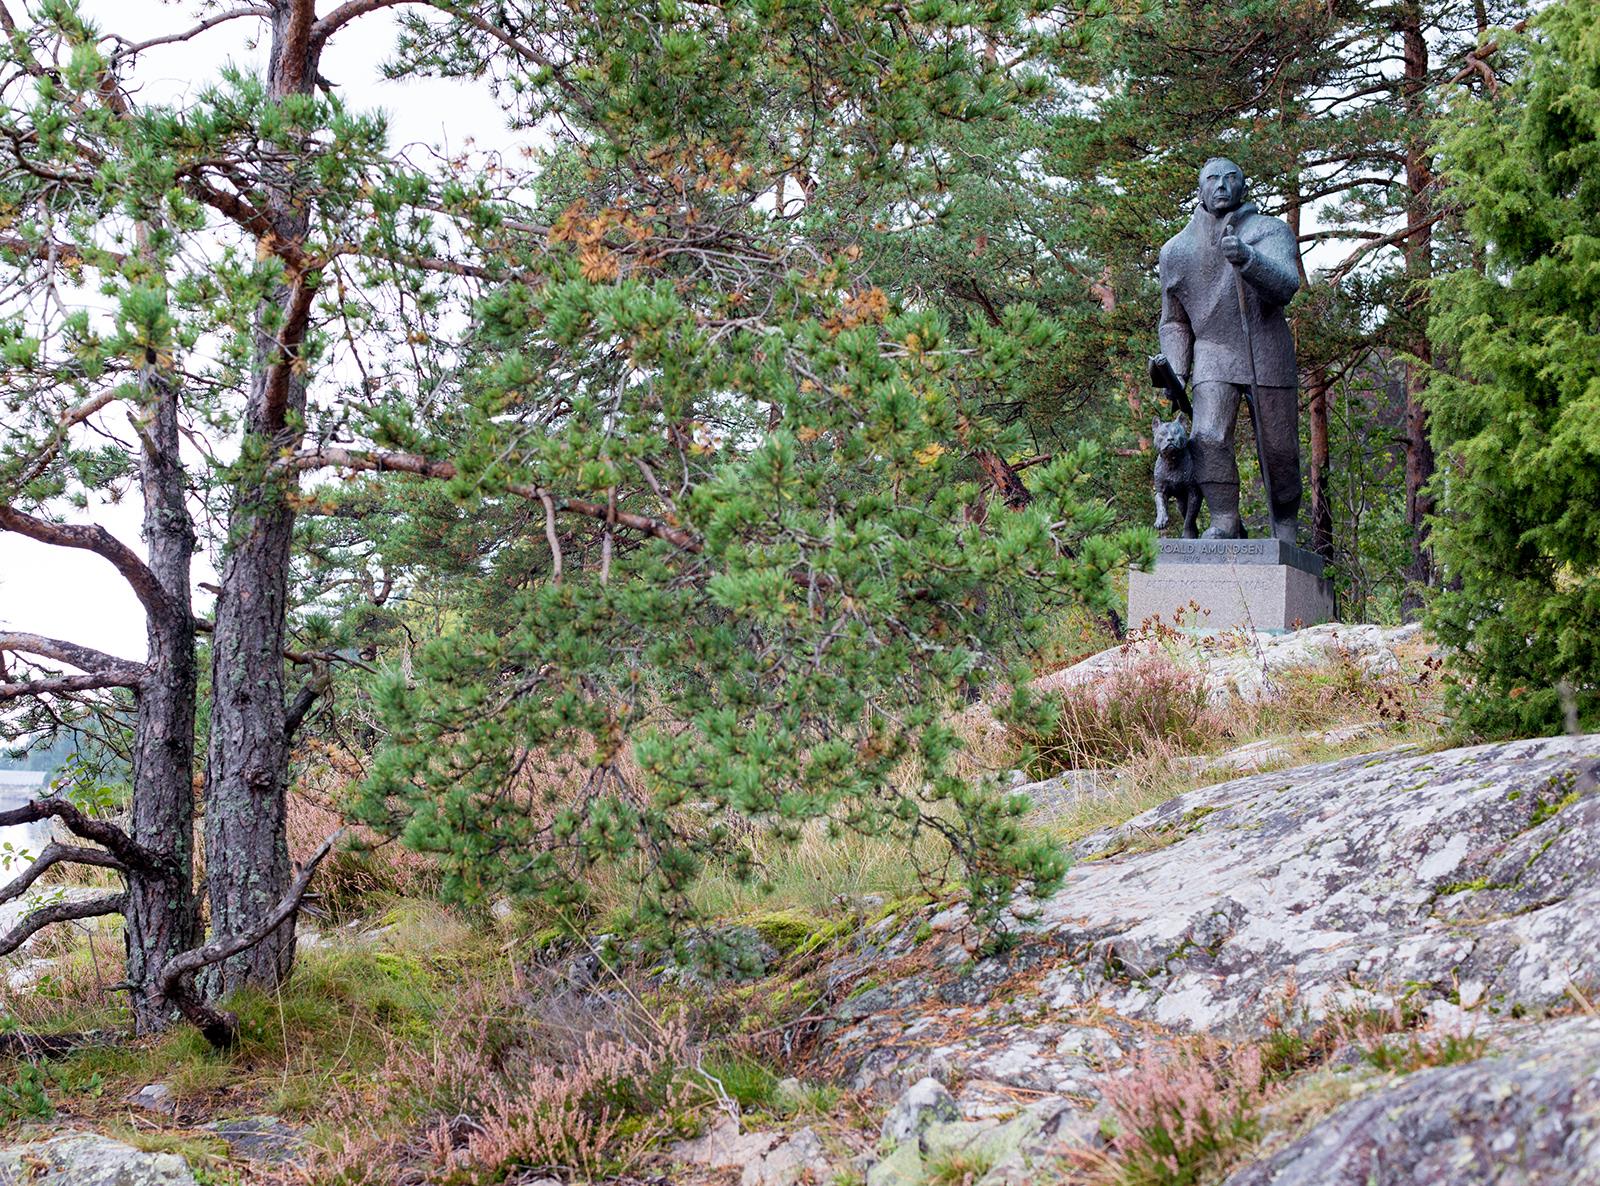 socha polárníka Roalda Amundsena, Svartskog, Norsko